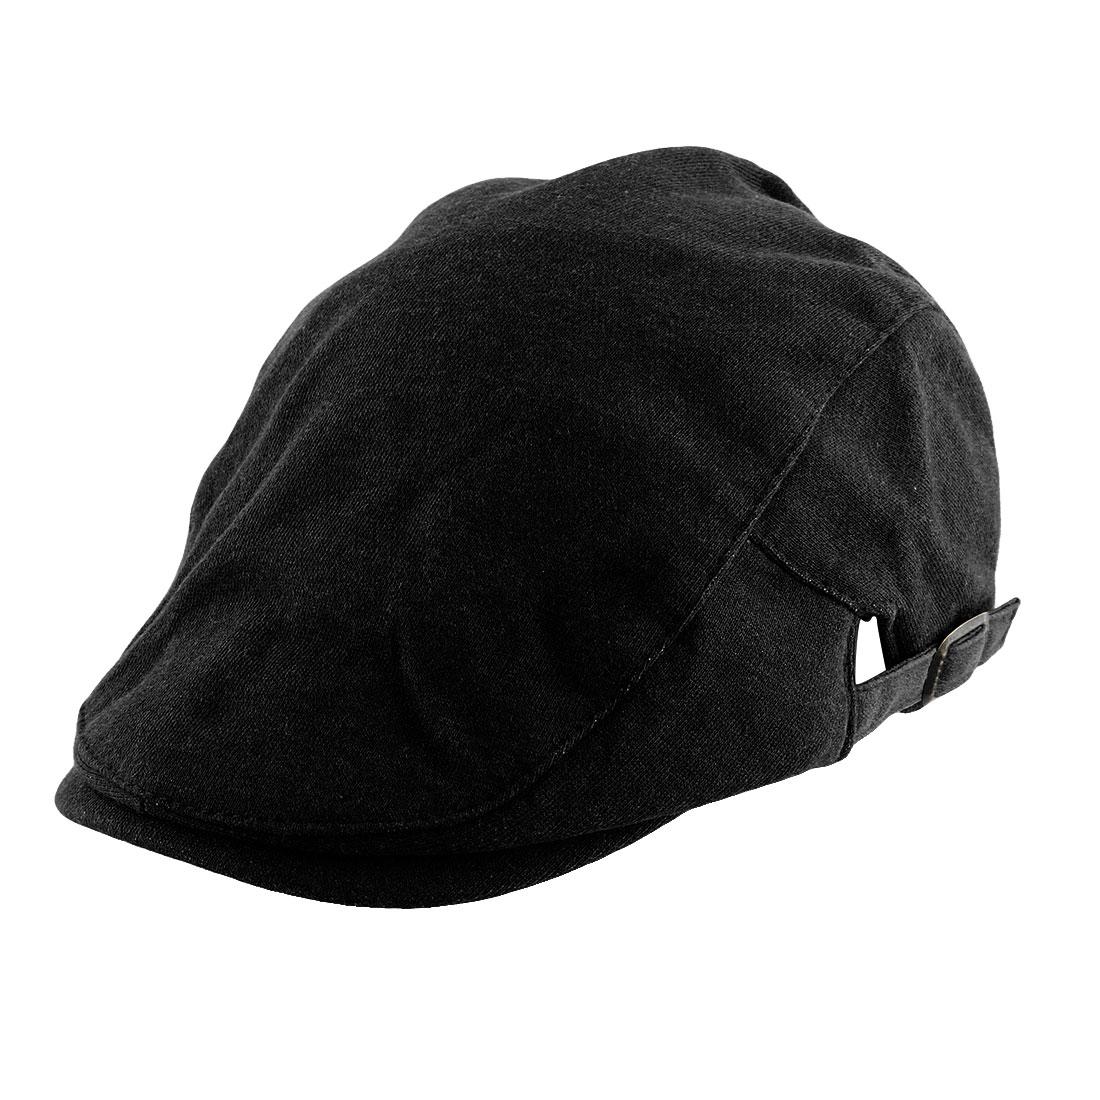 Men Women Vintage Style Newsboy Duckbill Ivy Cap Driving Flat Beret Hat Black